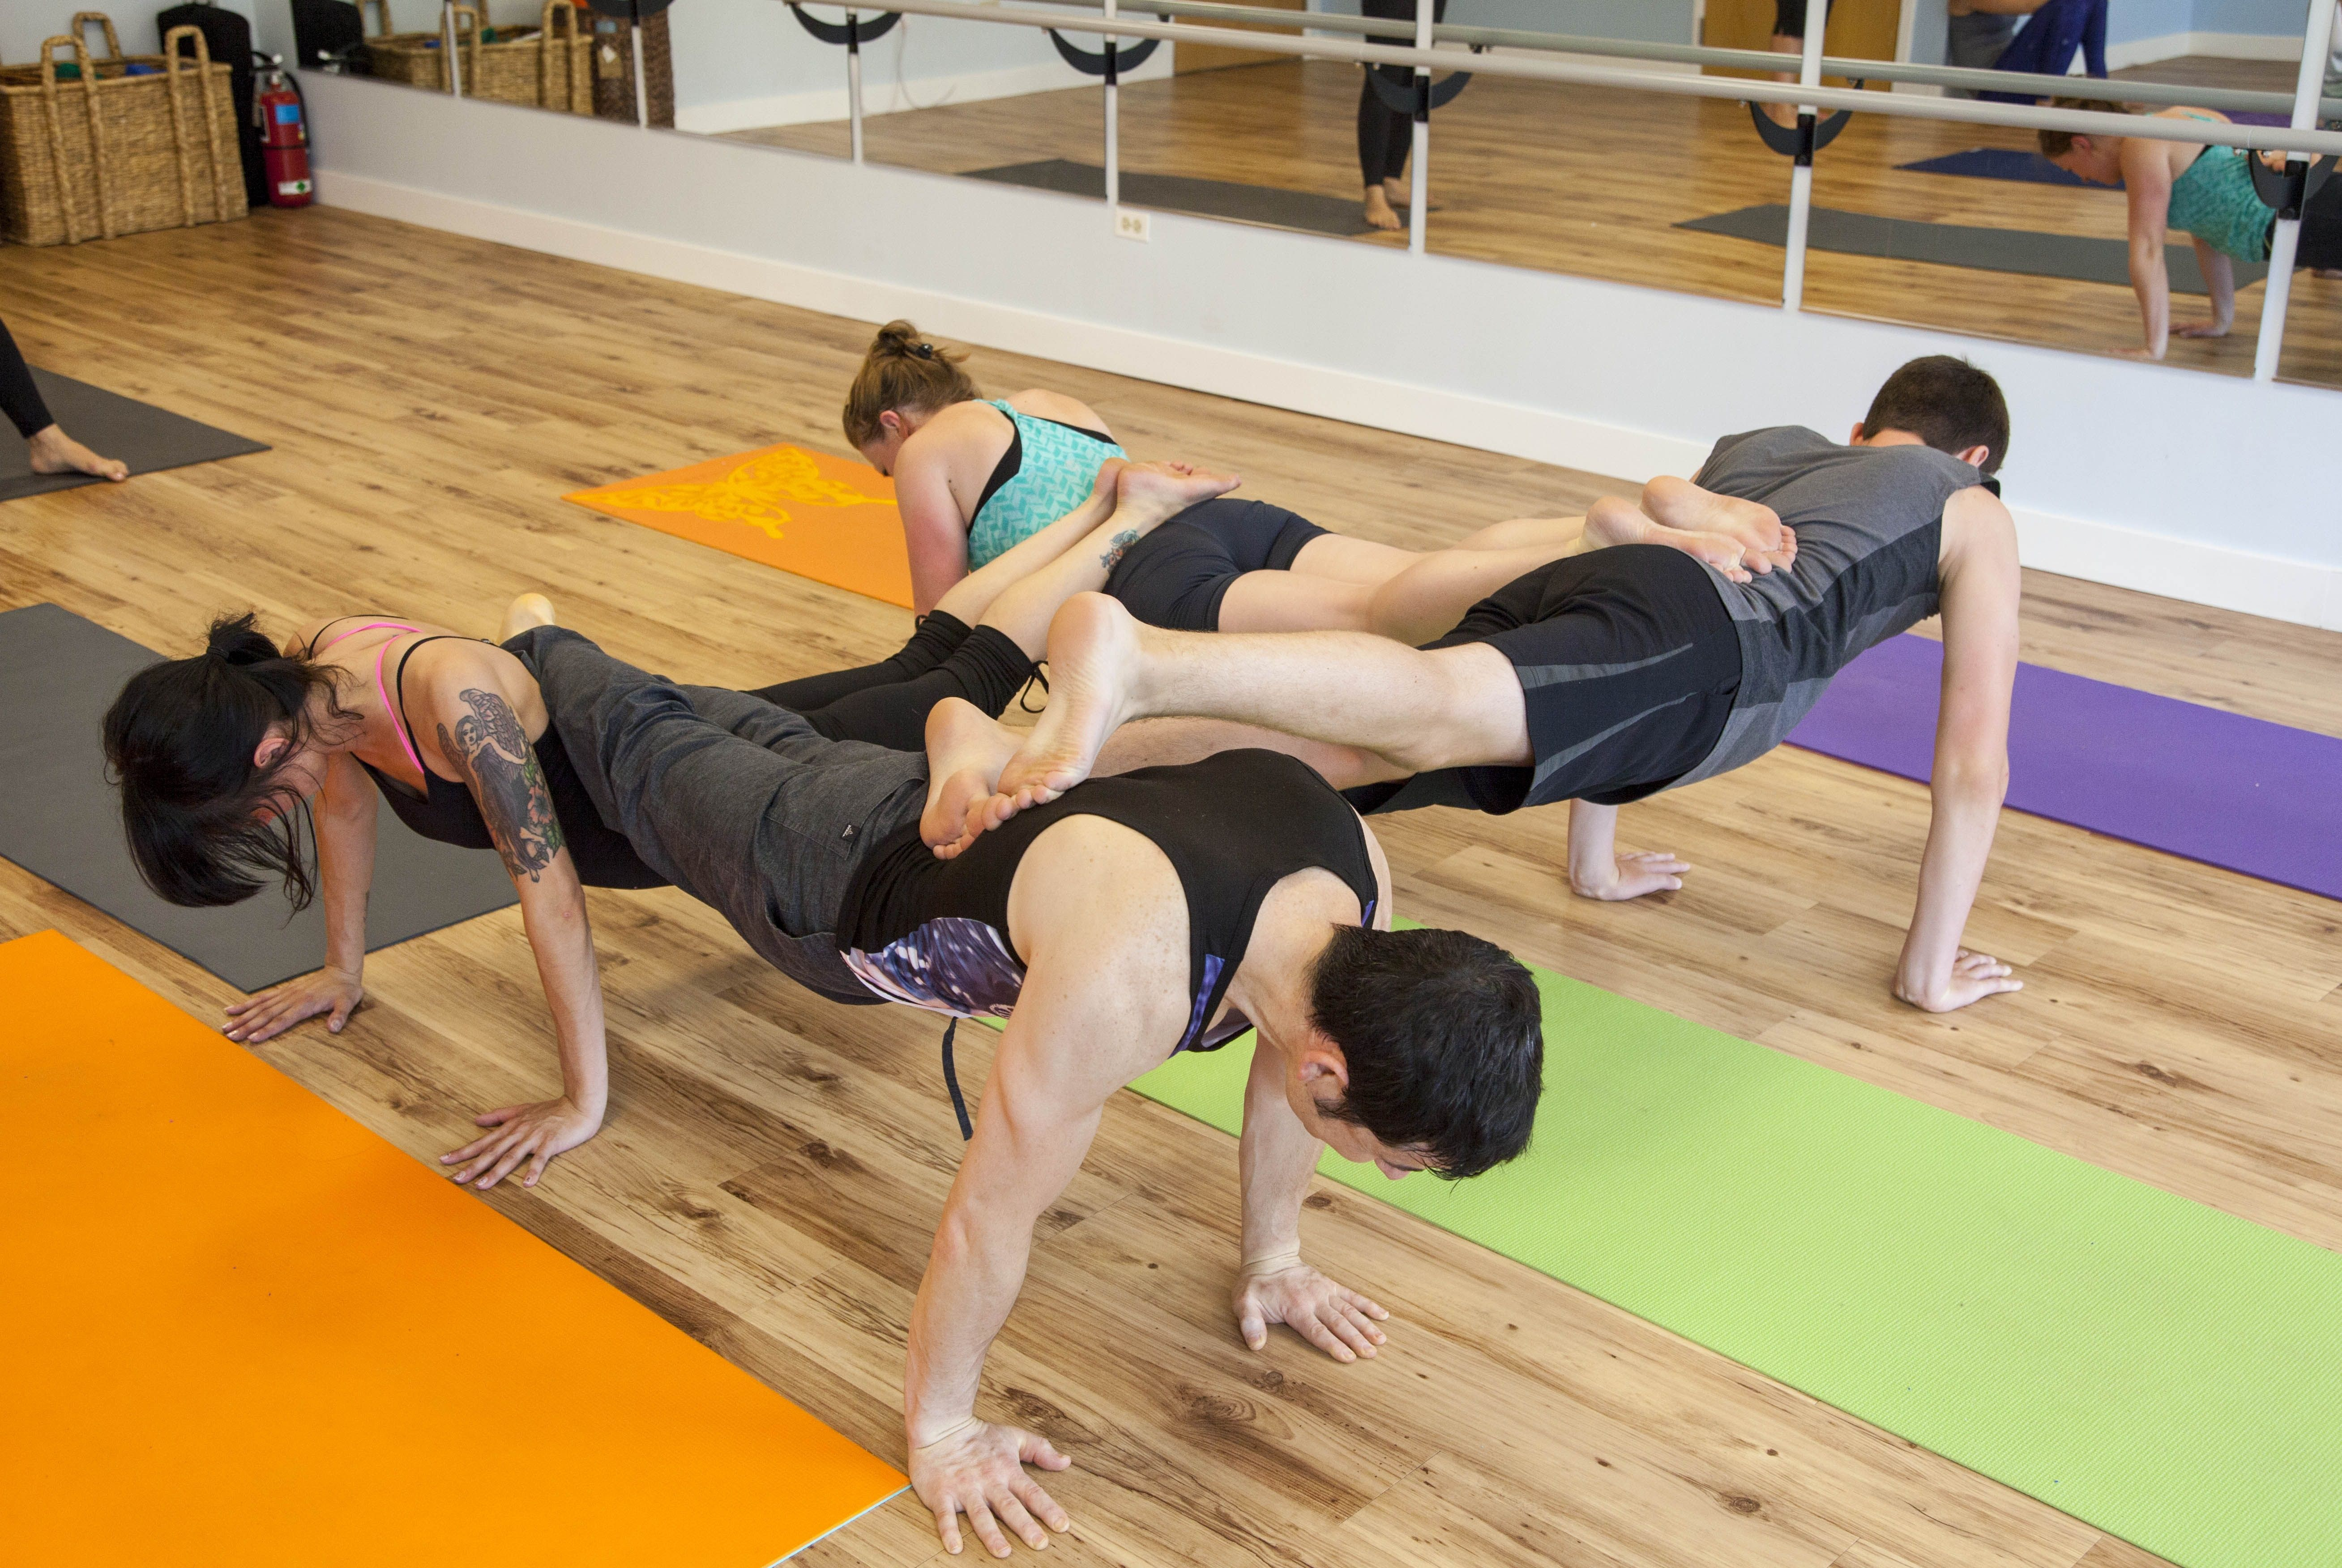 43-person-pushup.jpg (43×433)  Yoga challenge poses, Acro yoga